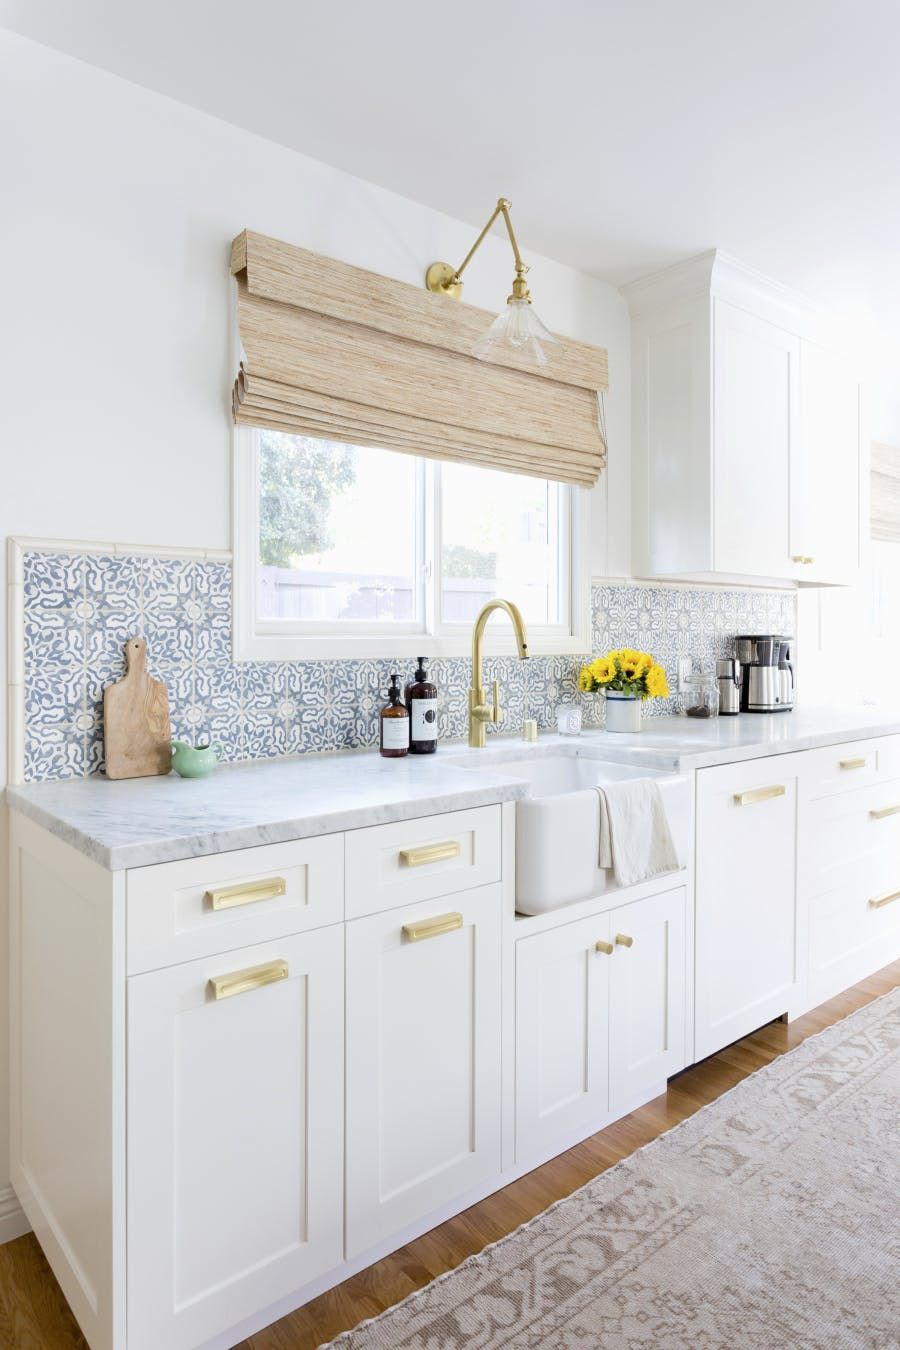 Tips Tricks 5 Design Tips For The Cement Tile Trend Kitchen Remodel Small Backsplash For White Cabinets Kitchen Interior